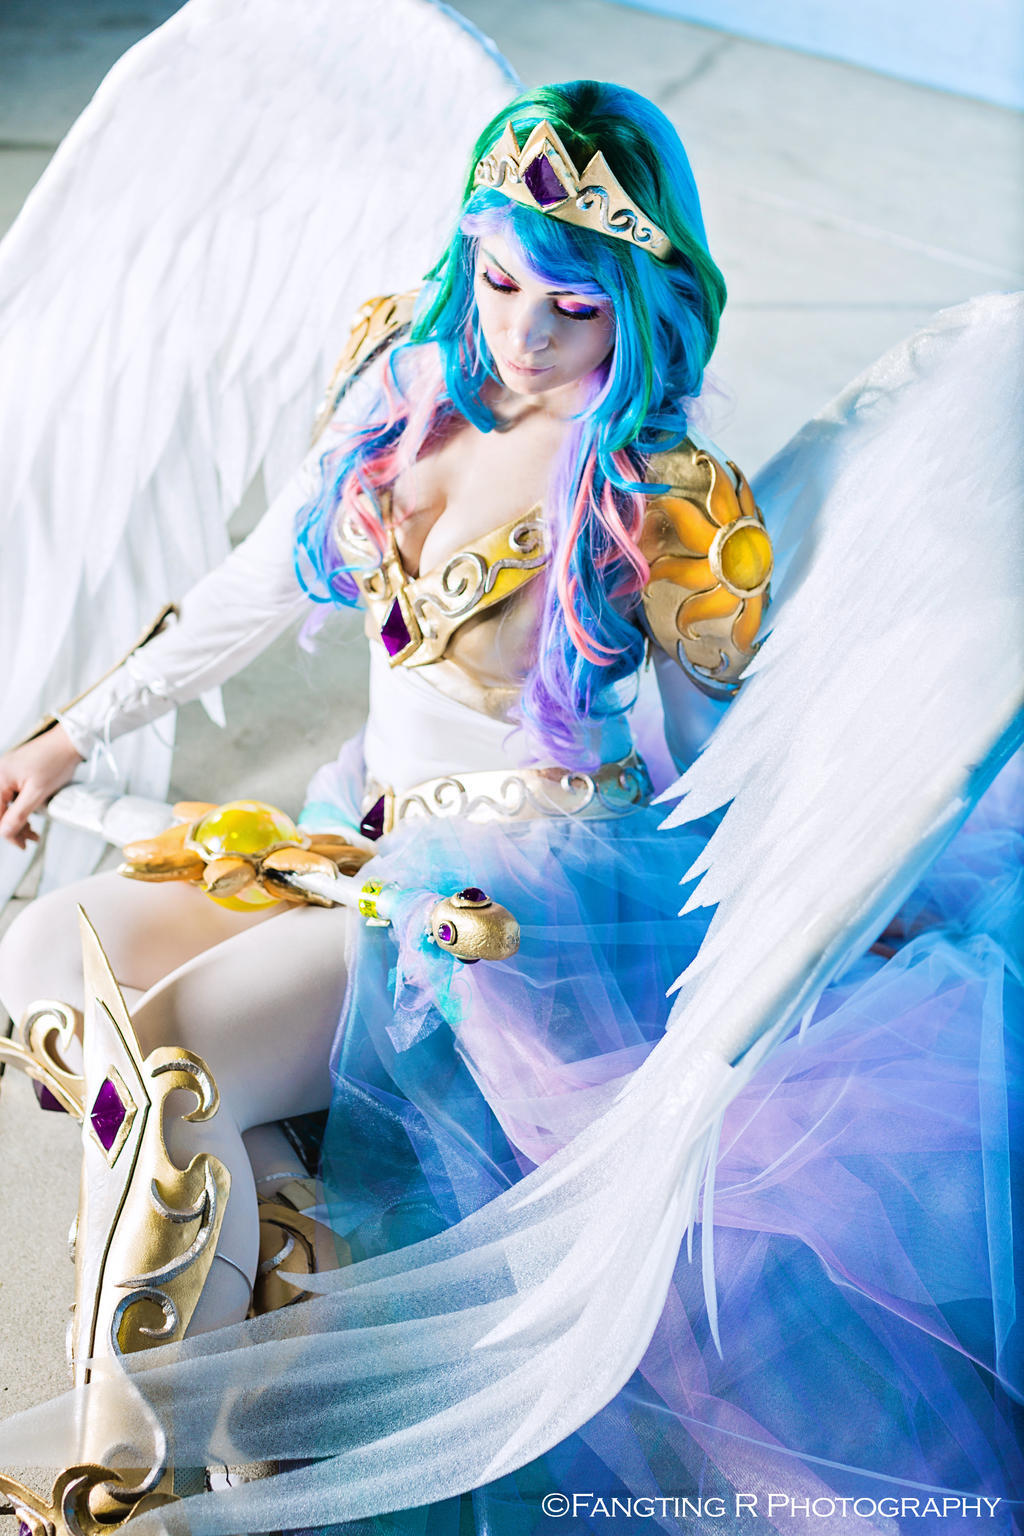 princess_celestia_by_annalynncosplay_d9xu0p9-fullview.jpg